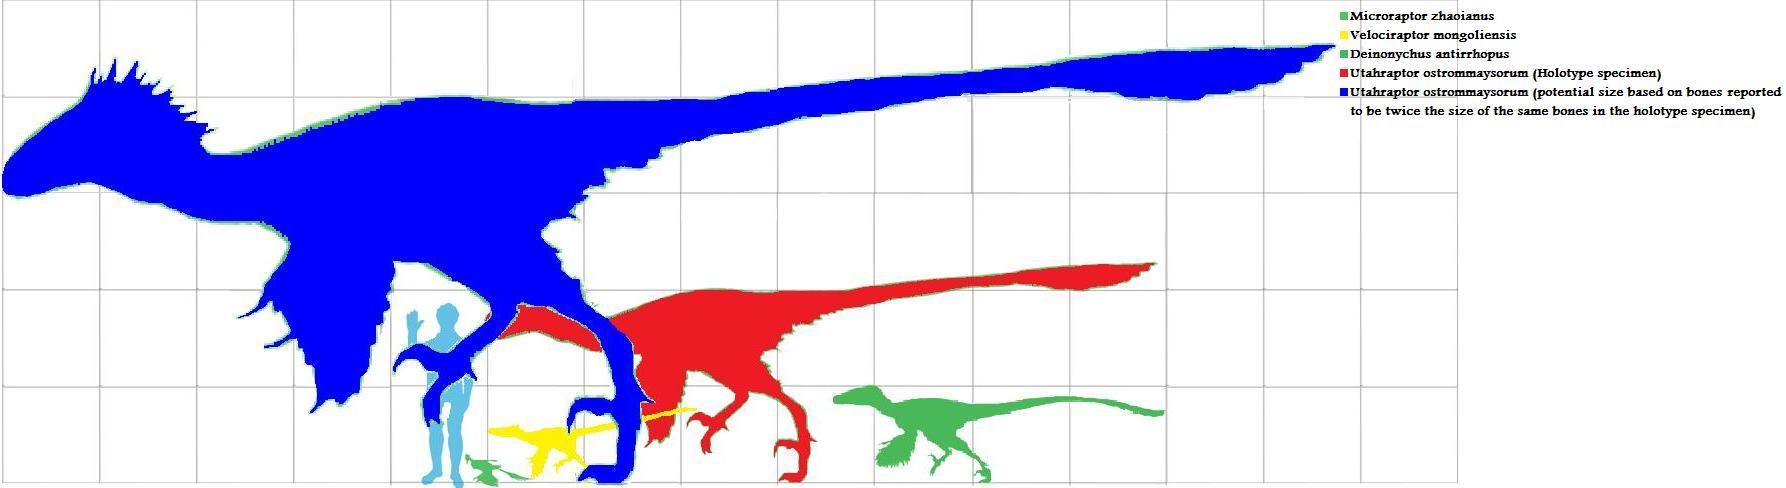 Brachiosaurus altithorax v Utahraptor ostrommaysorum (pack ...